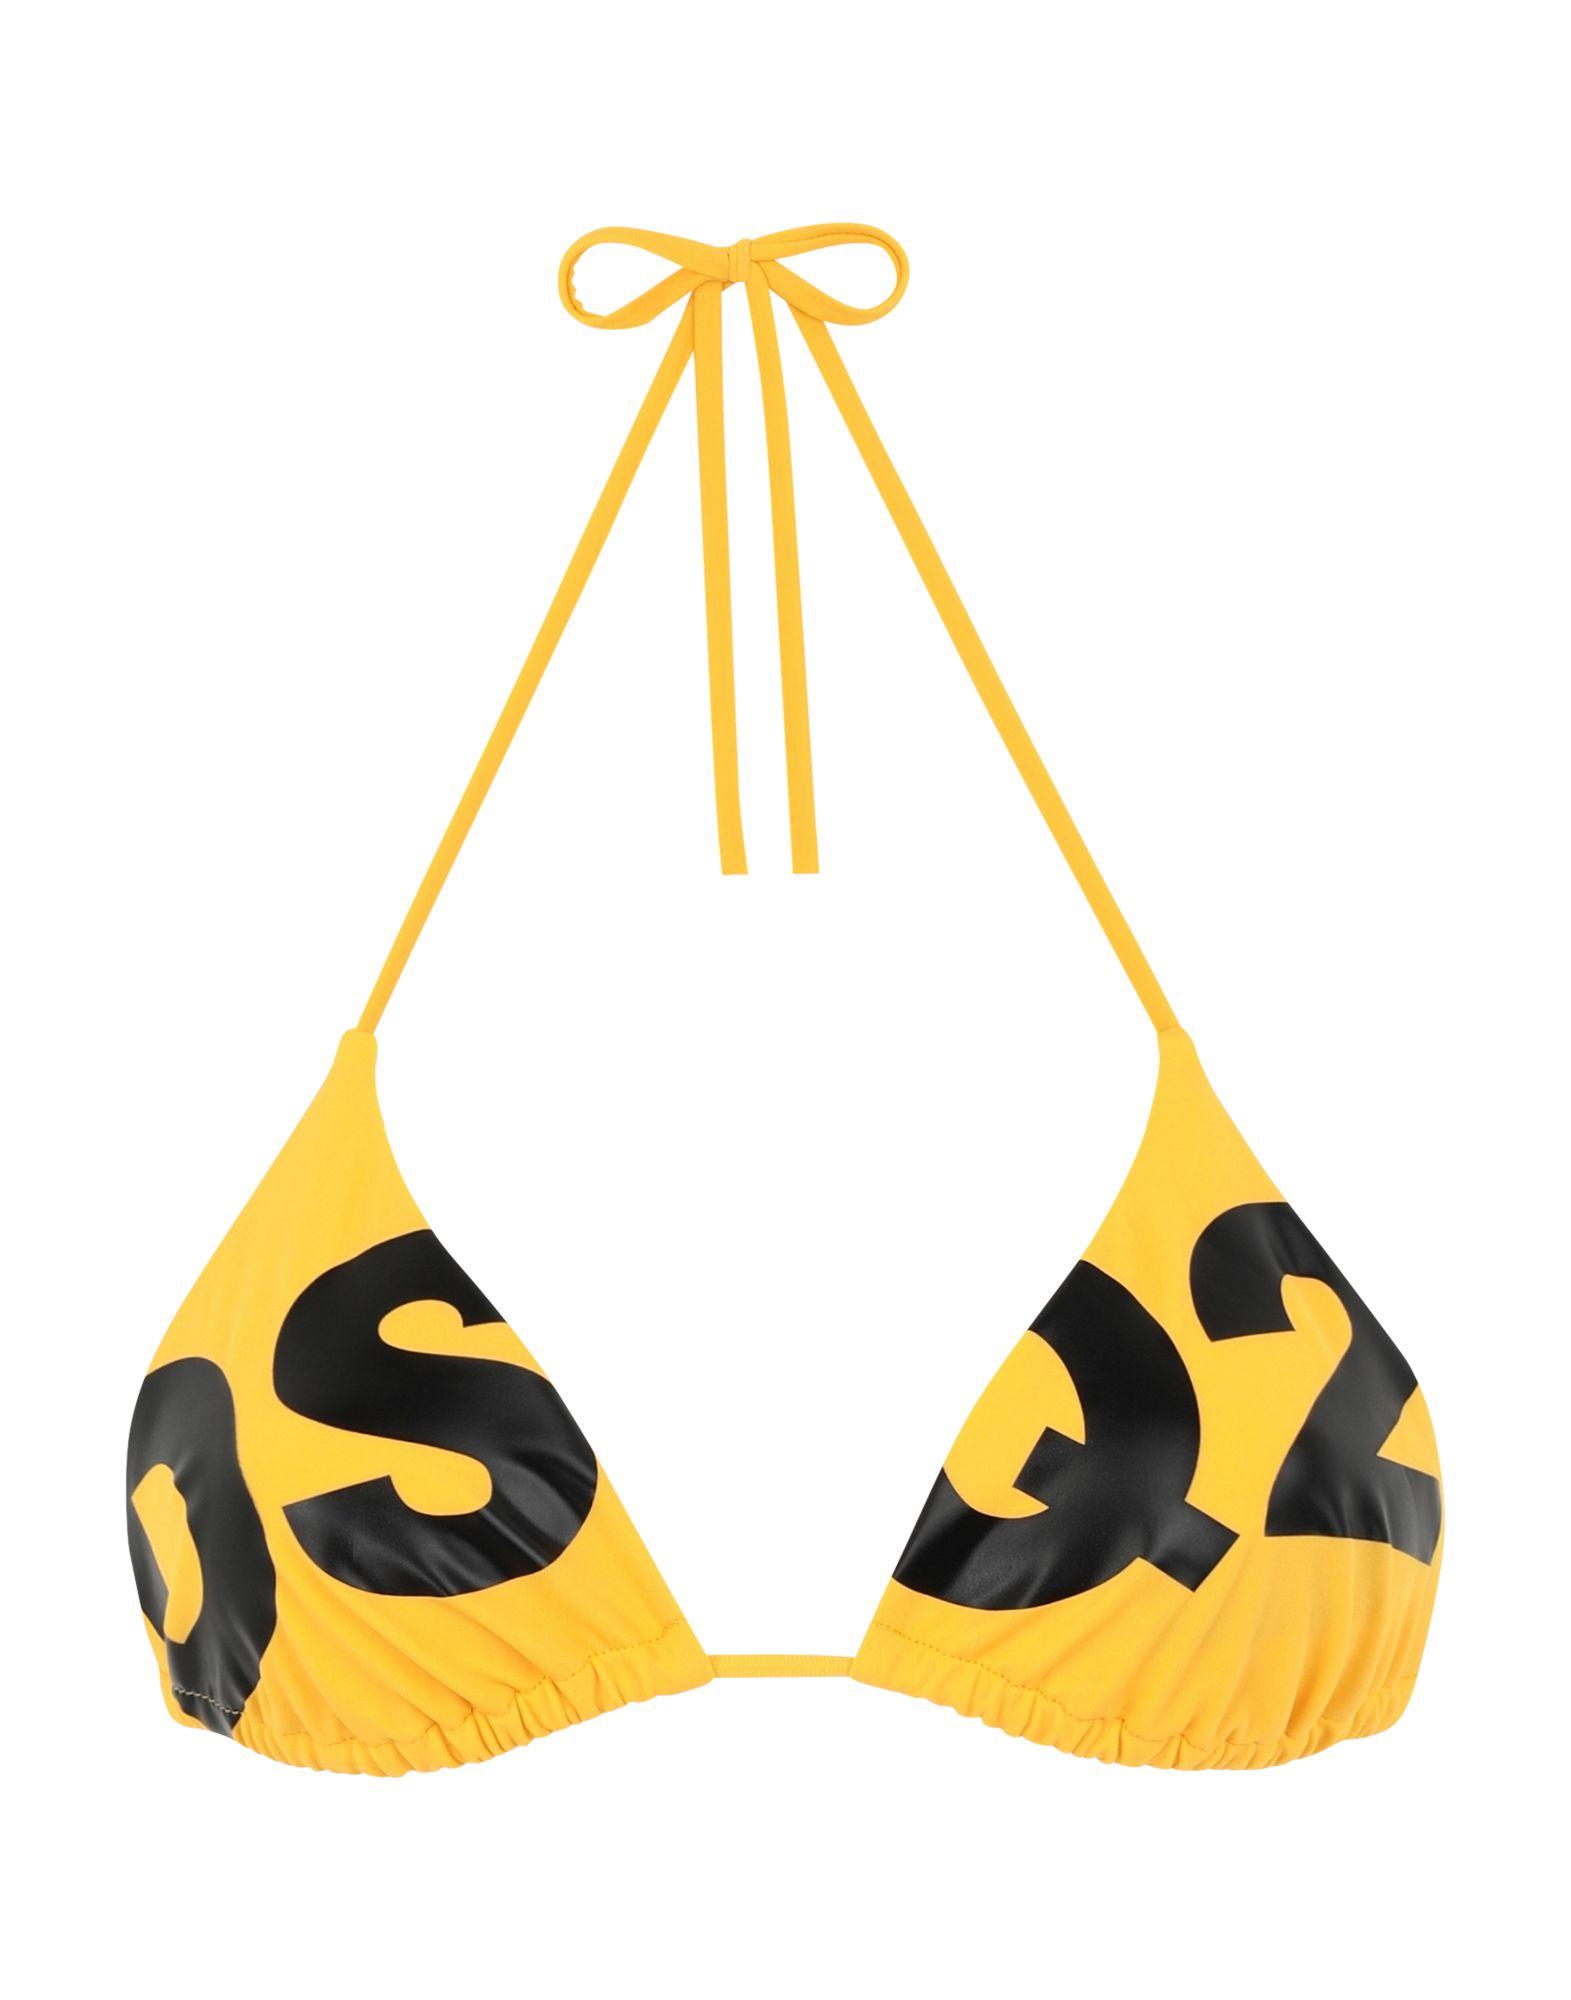 DSQUARED2 Bikini tops - Item 47264627